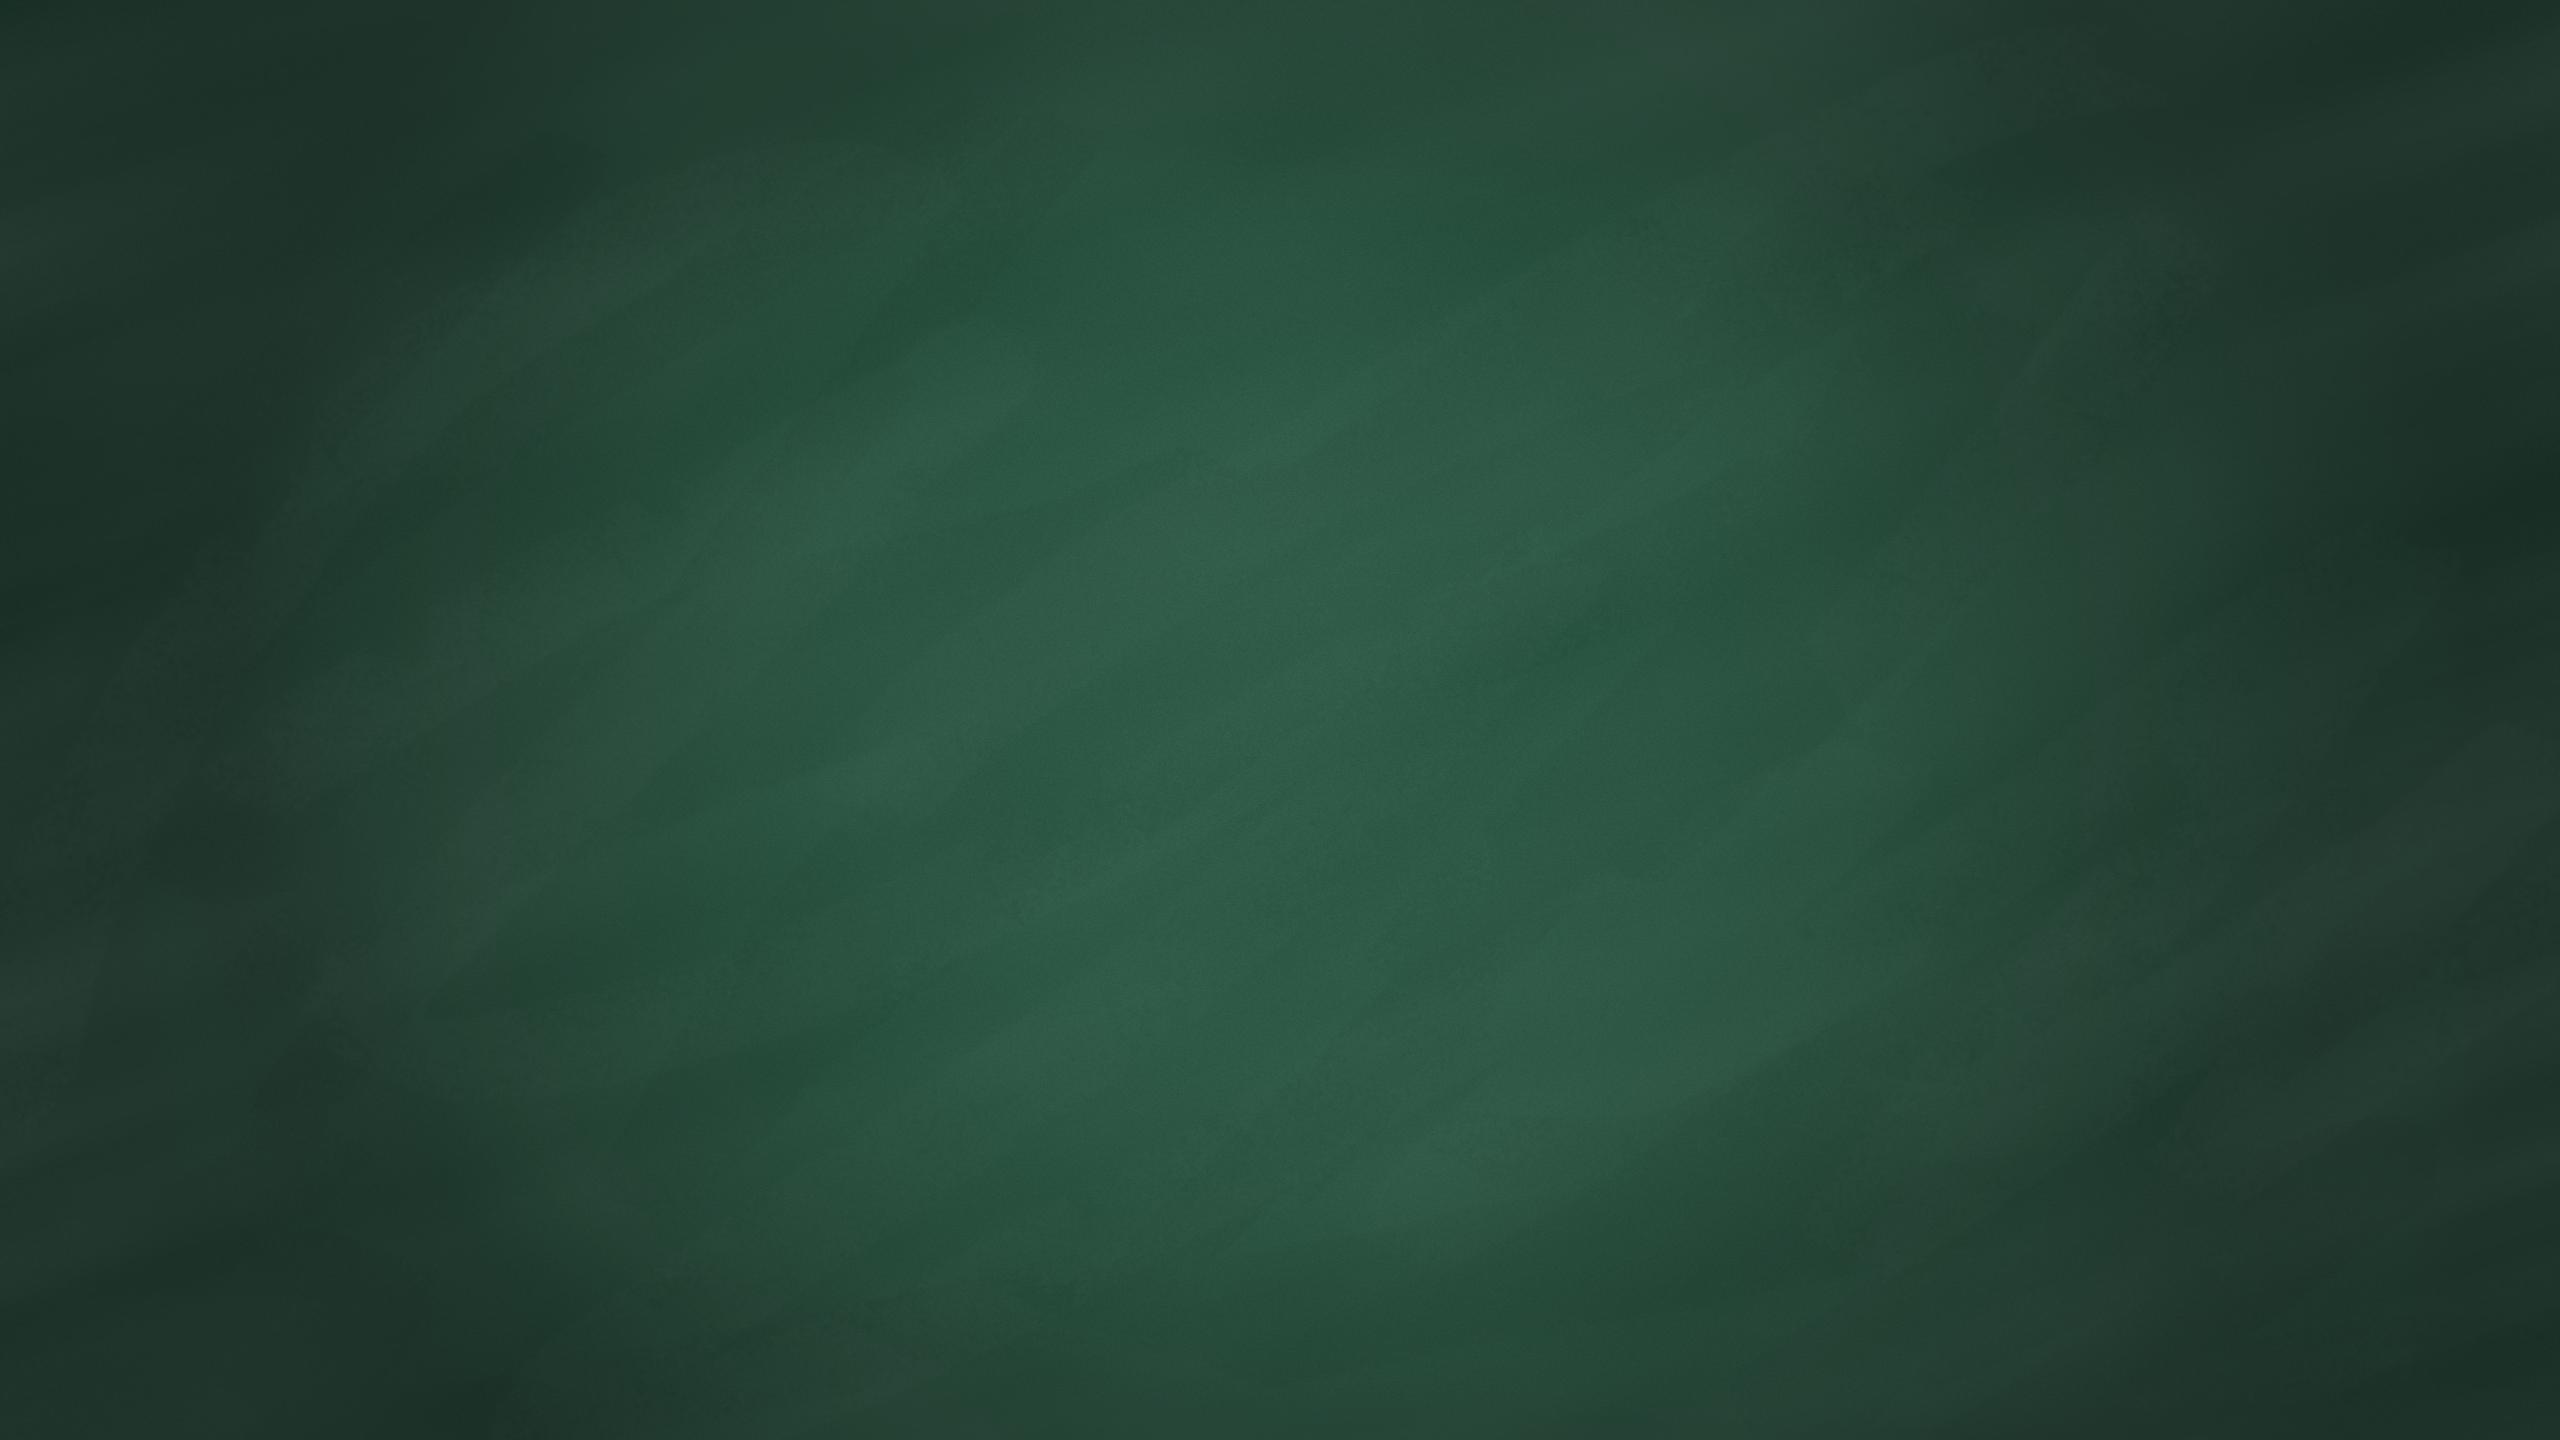 chalk board texture by blueamnesiac on deviantart